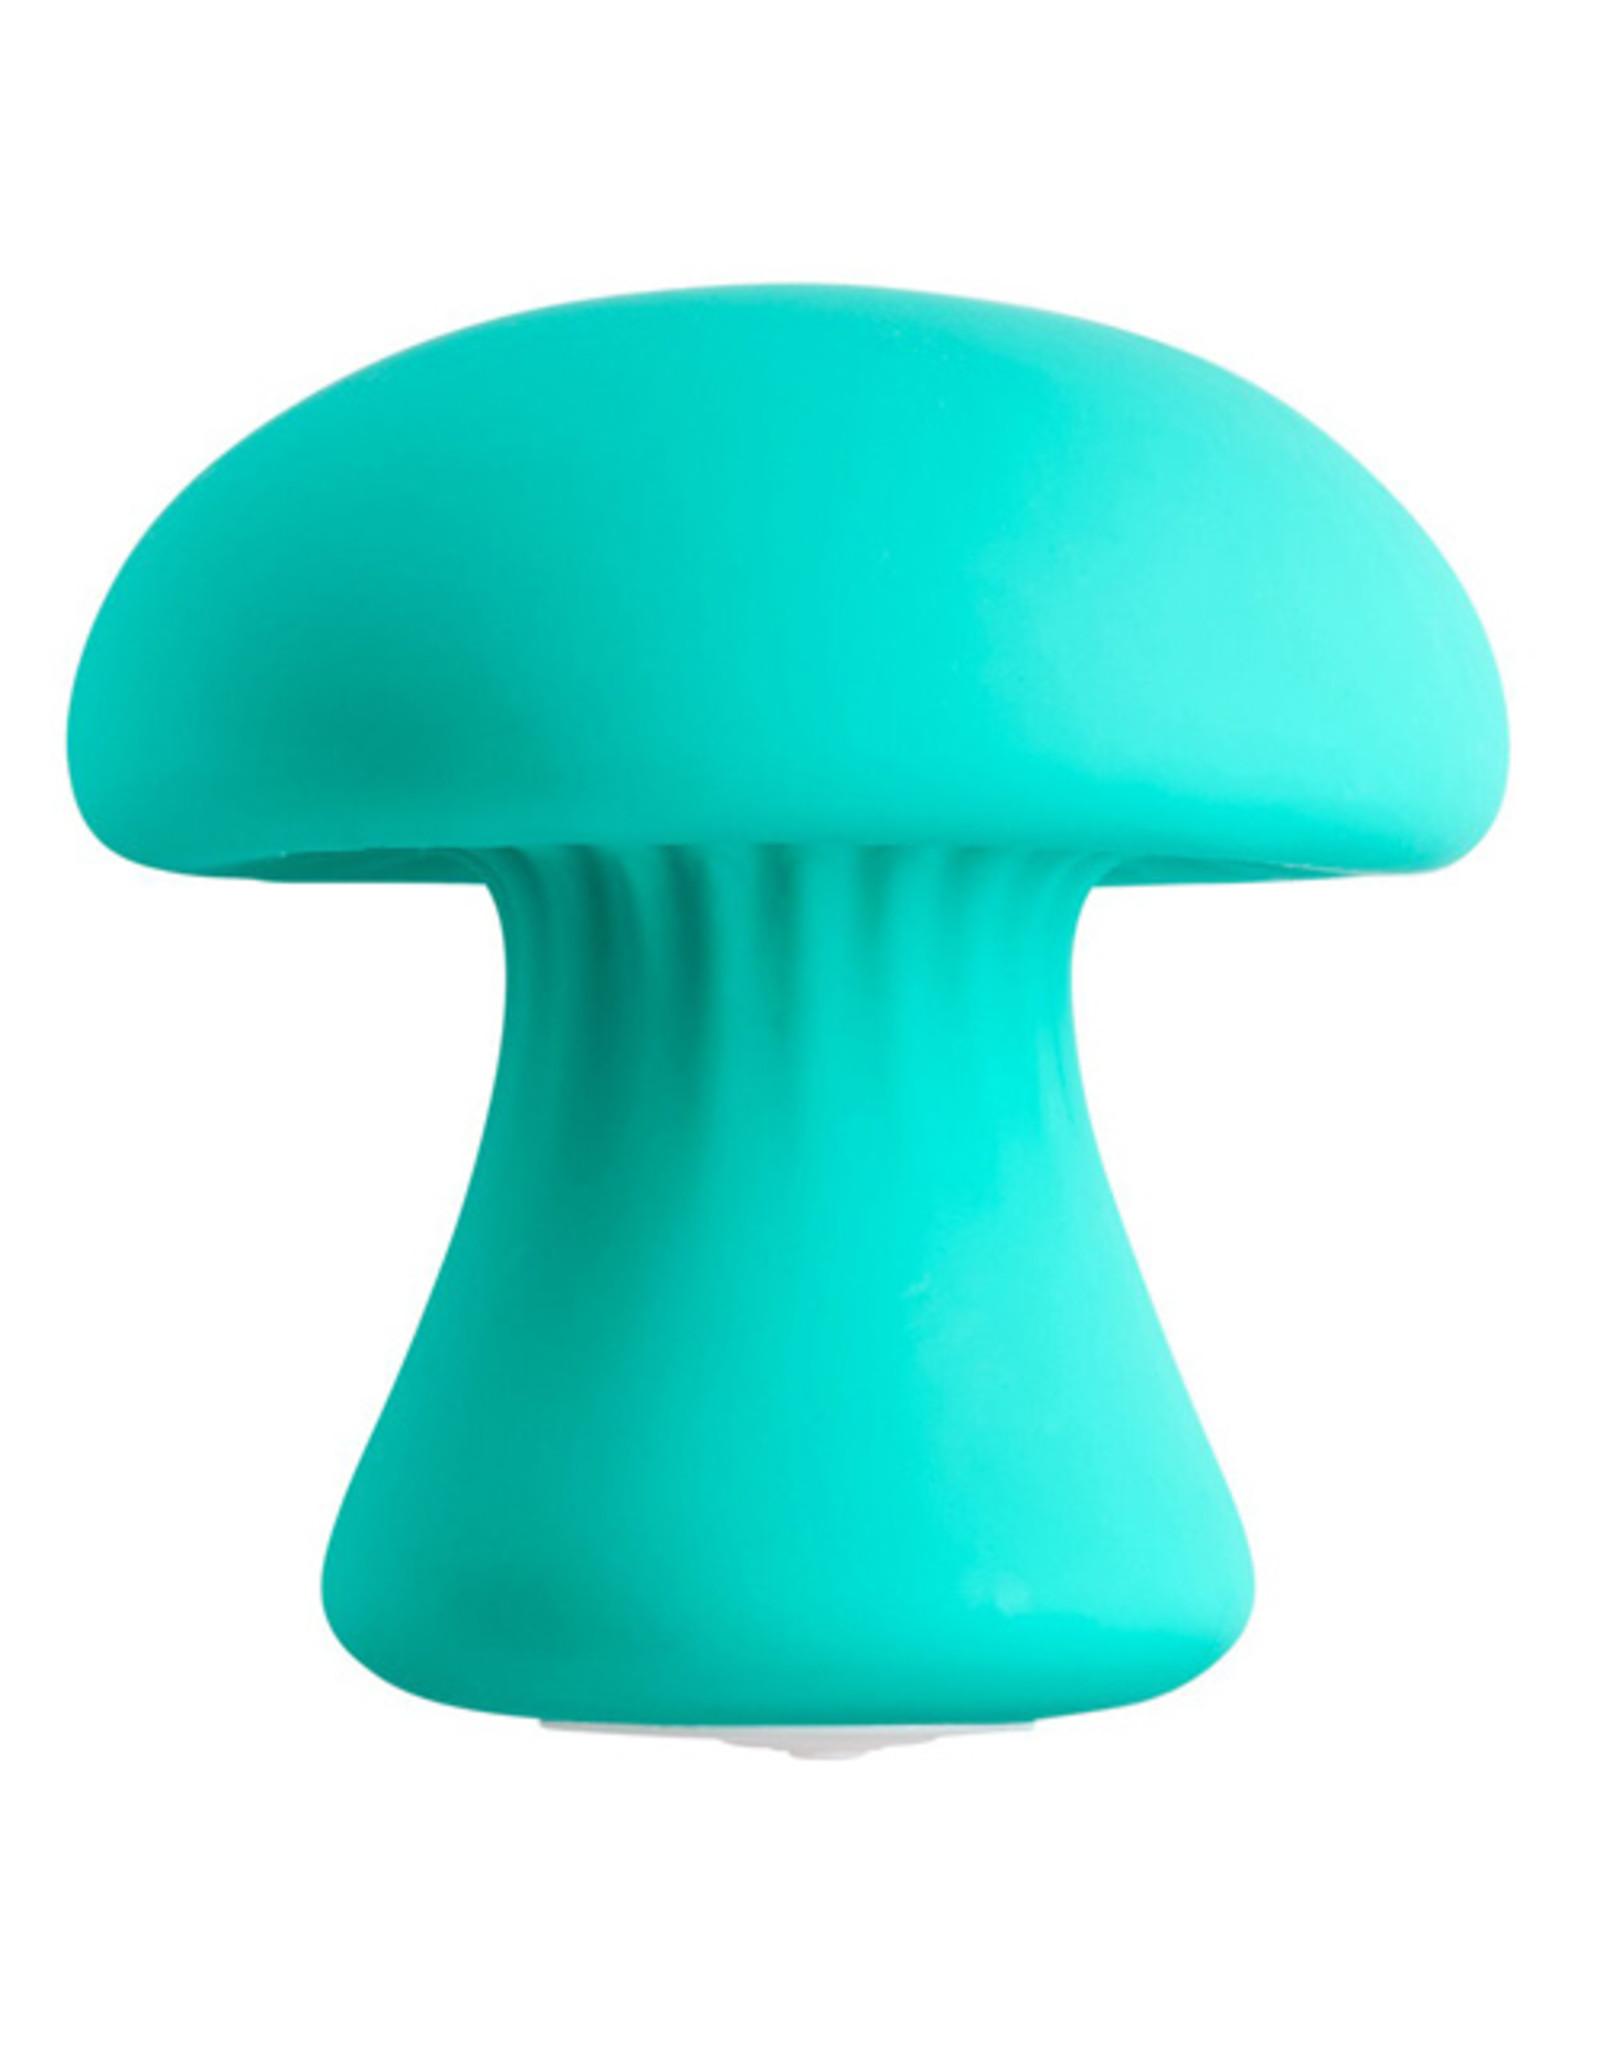 Cloud 9 Mushroom Massager - Groenblauw